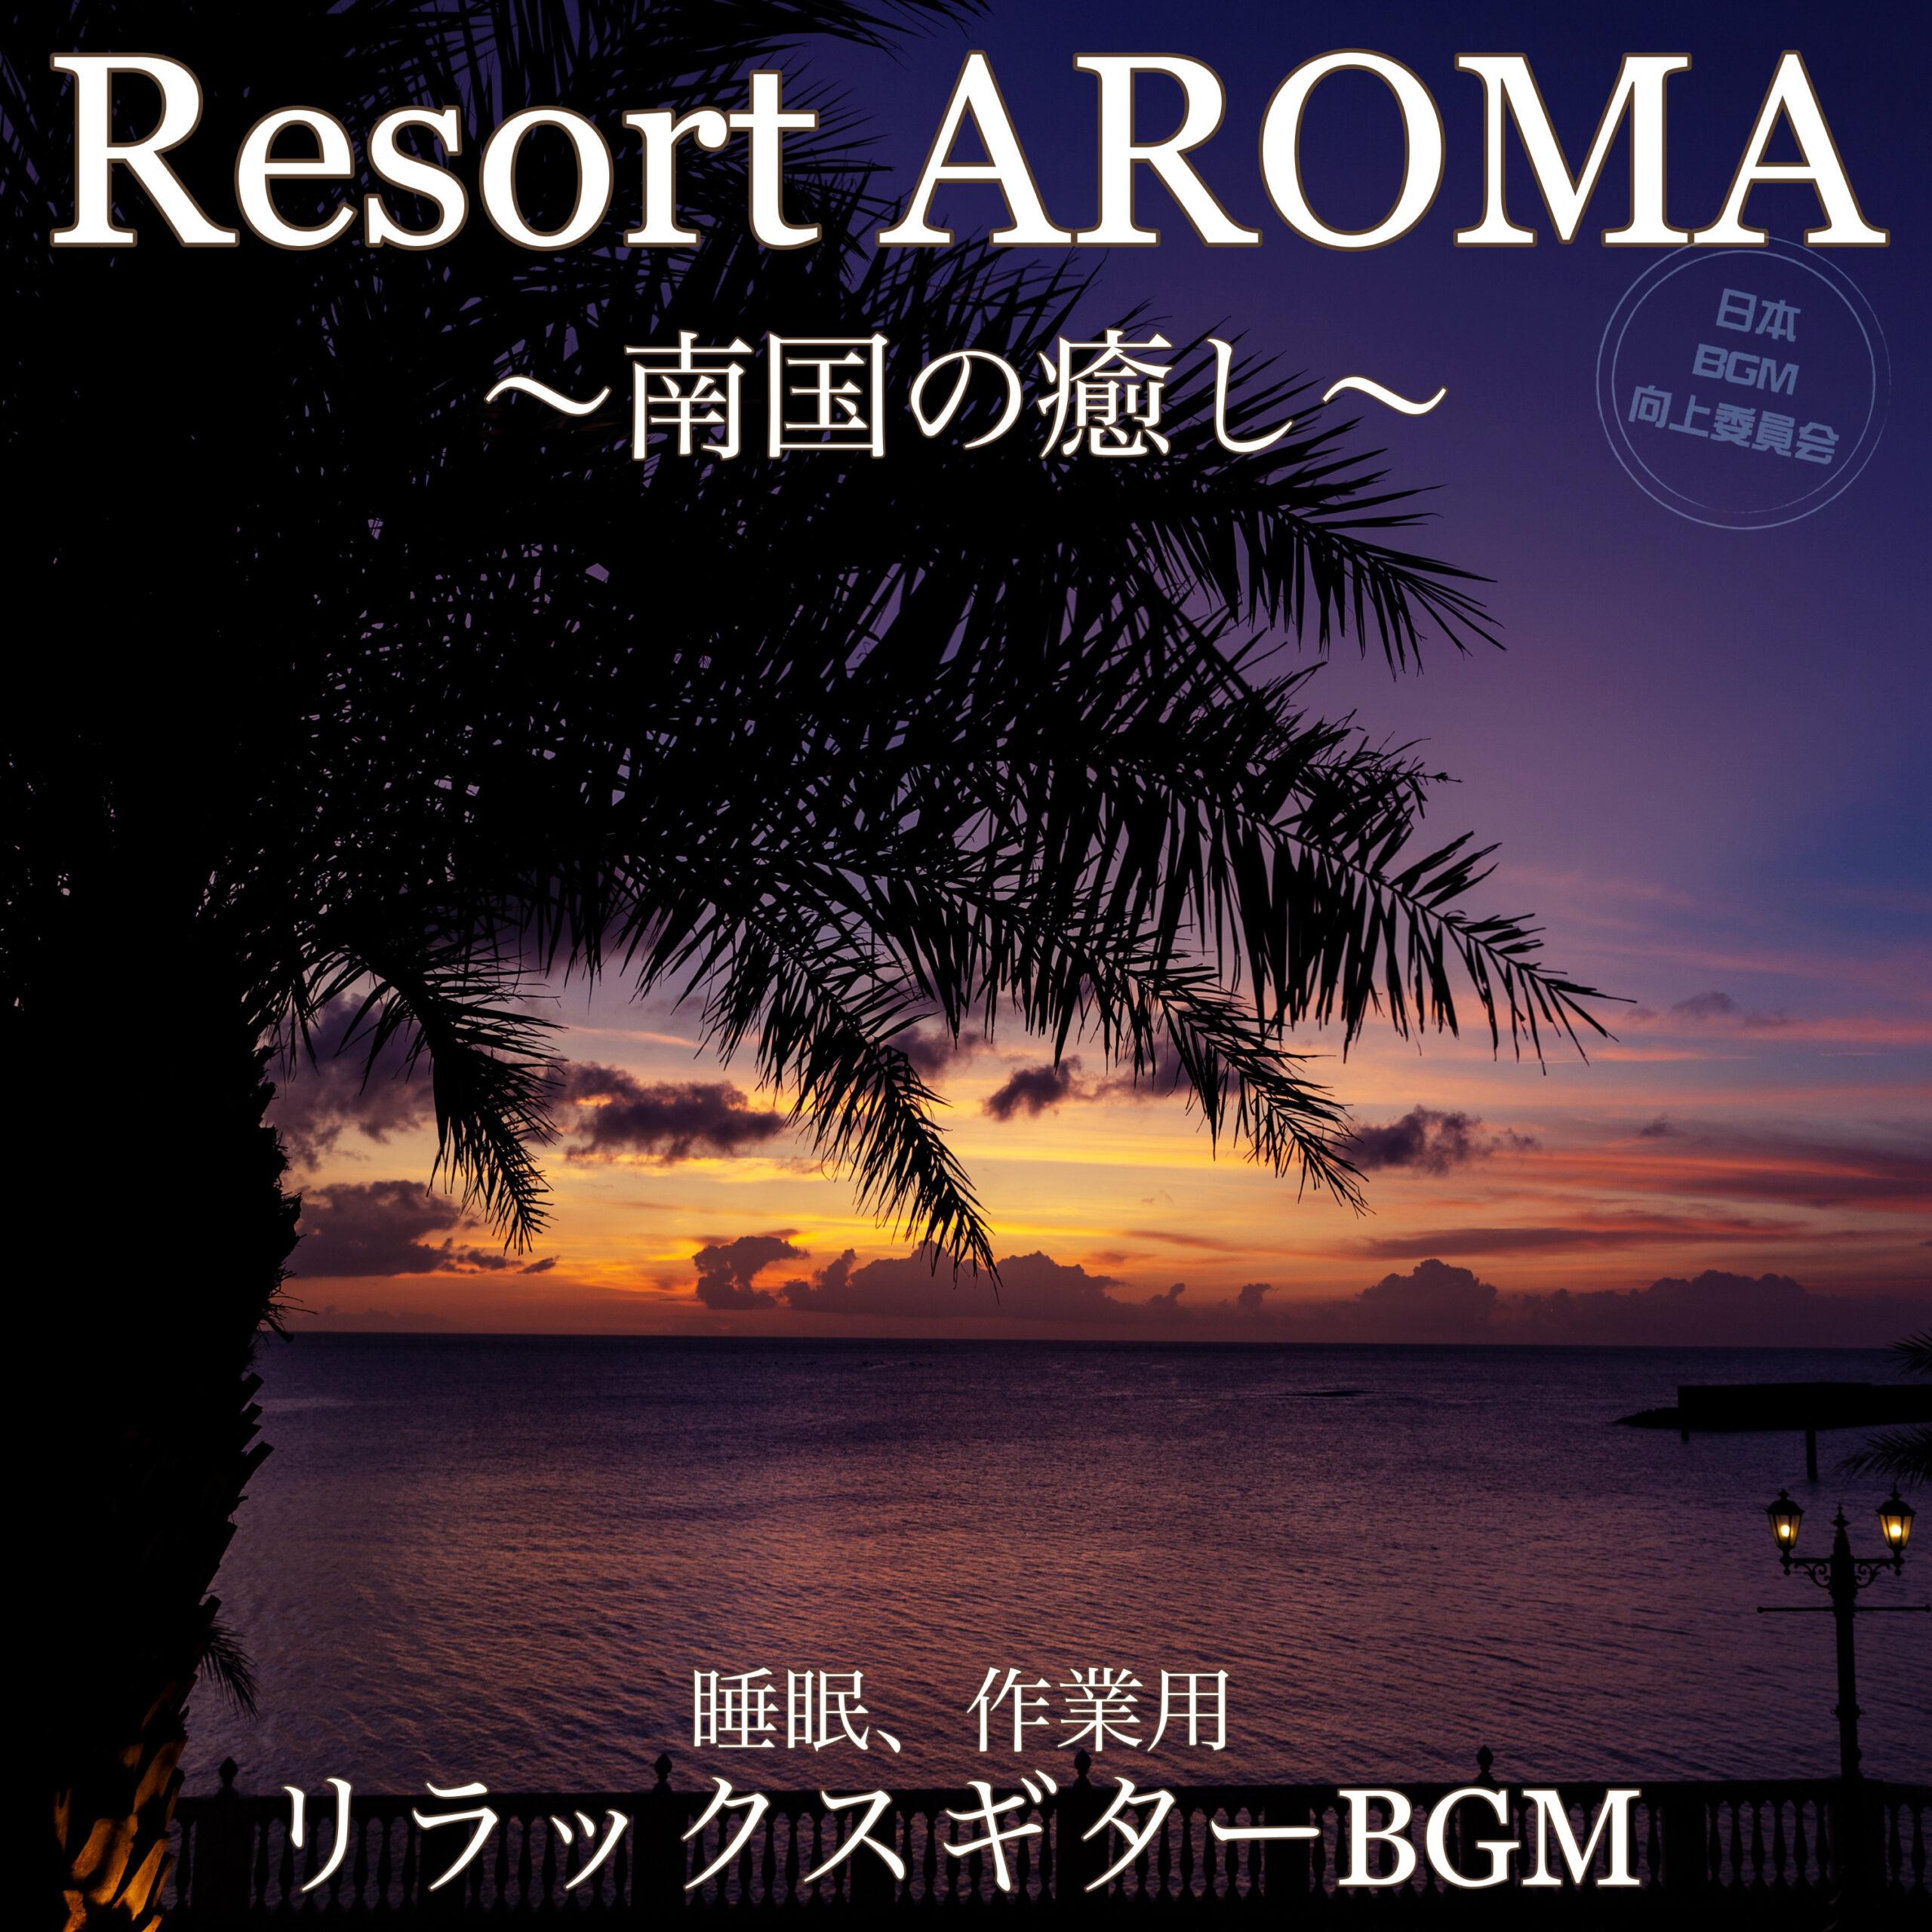 Resort AROMA 〜南国の癒し〜 睡眠、作業用 リラックスギターBGM